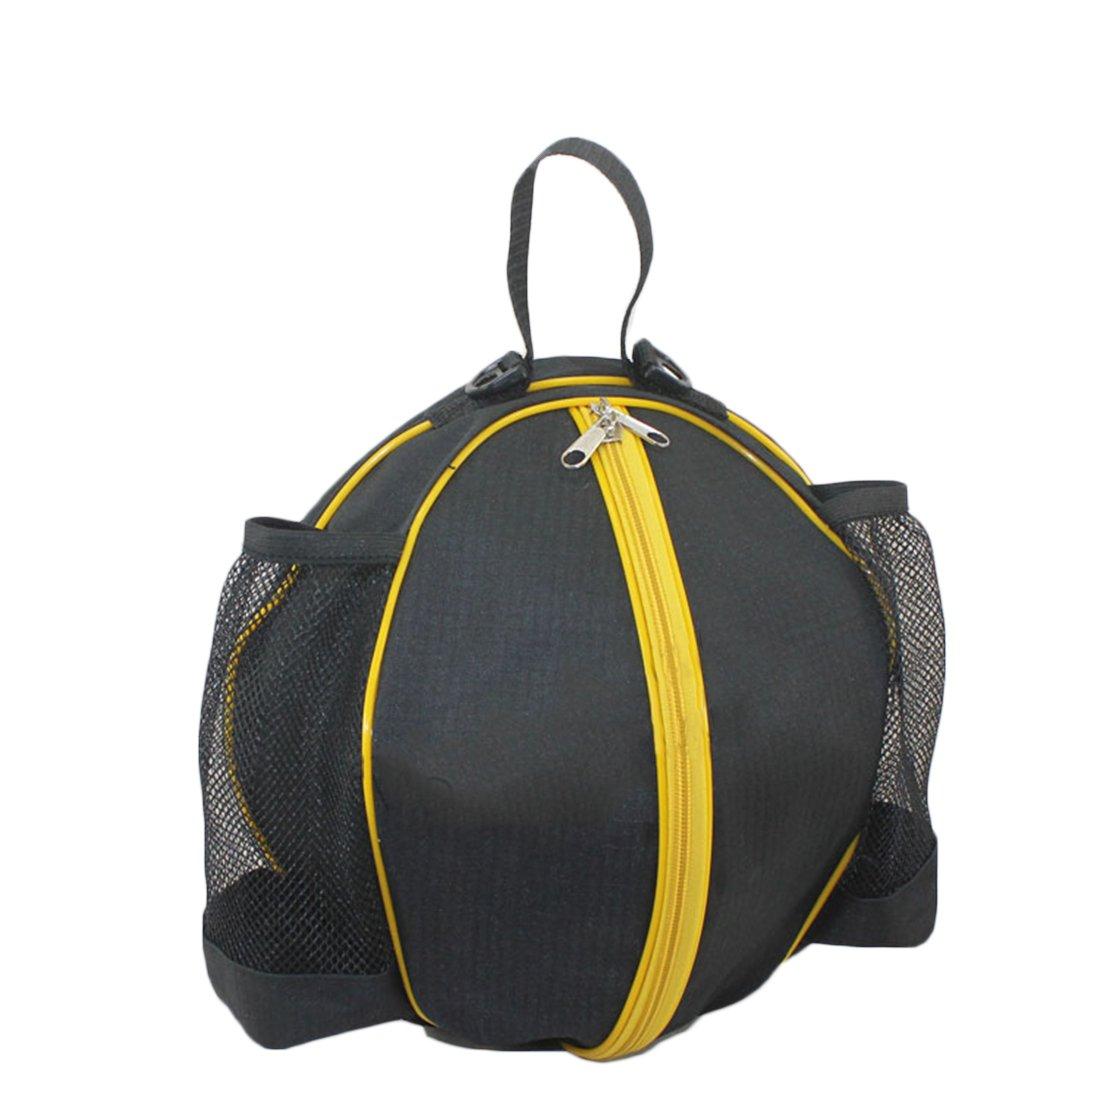 iTECHOR Duarble Roundedバスケットボールトレーニングsingle-shoulderバッグ調節可能なサッカースポーツストレージバッグ B077TLW7SJ Black + Yellow